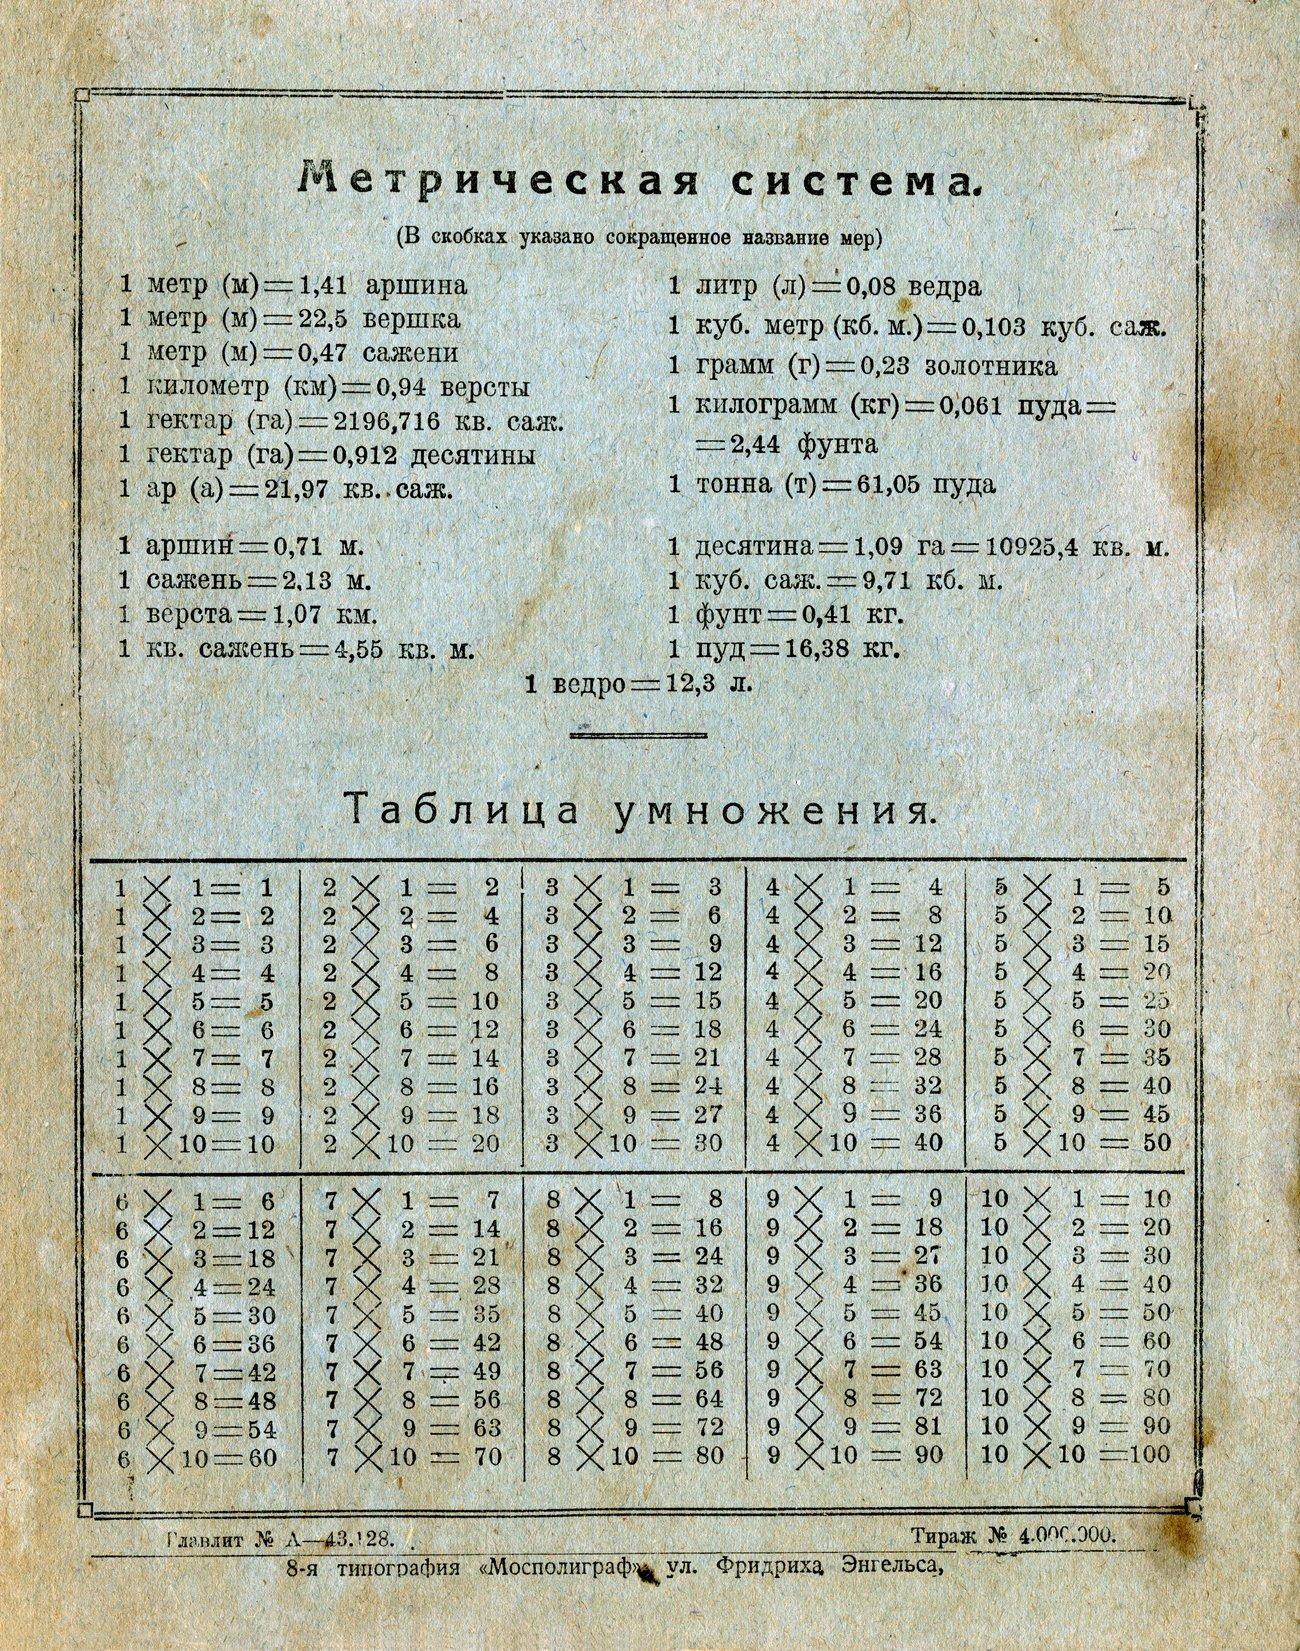 Тетрадь СССР (34), оборот